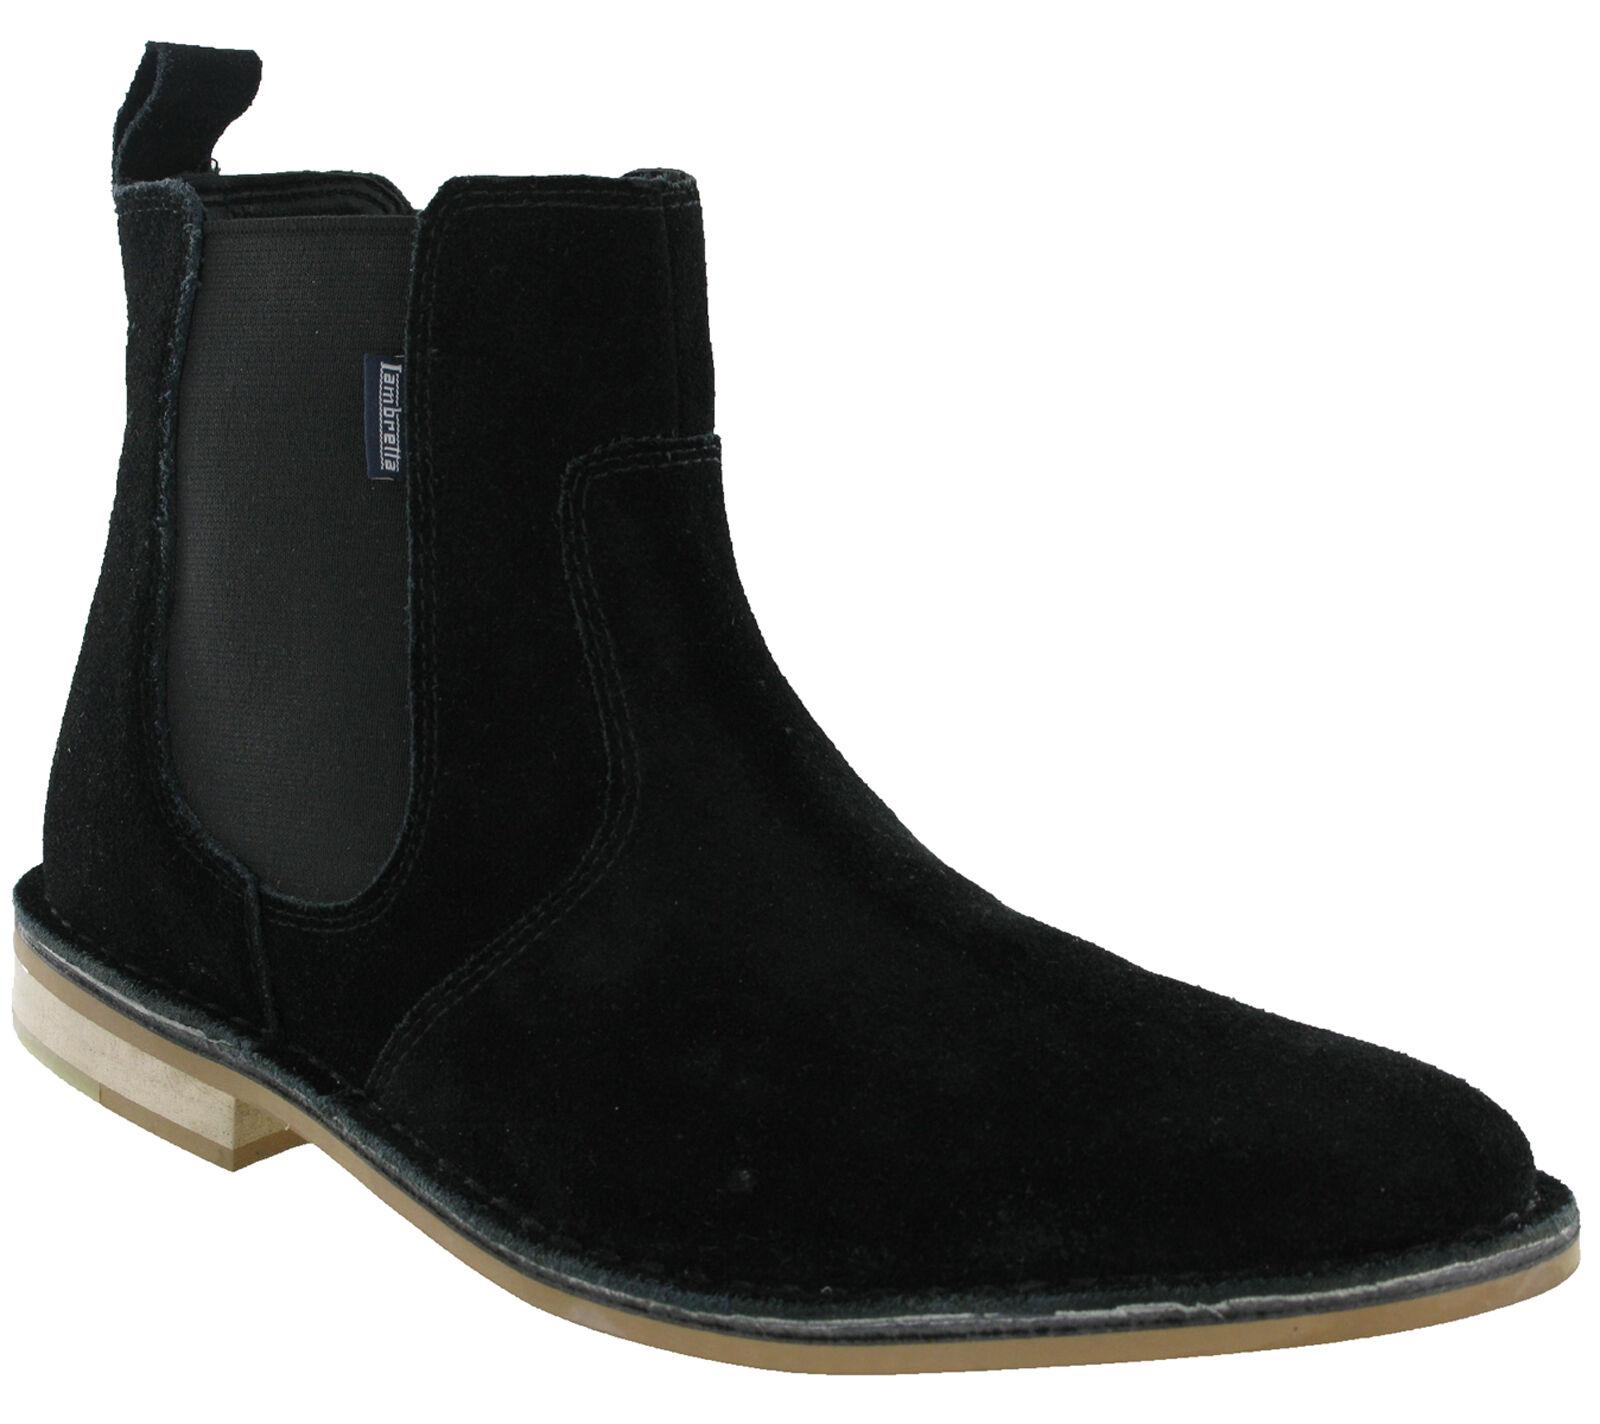 Lambretta Black Chelsea Boots Desert Ankle Suede Leather Dealer Pull On Mens